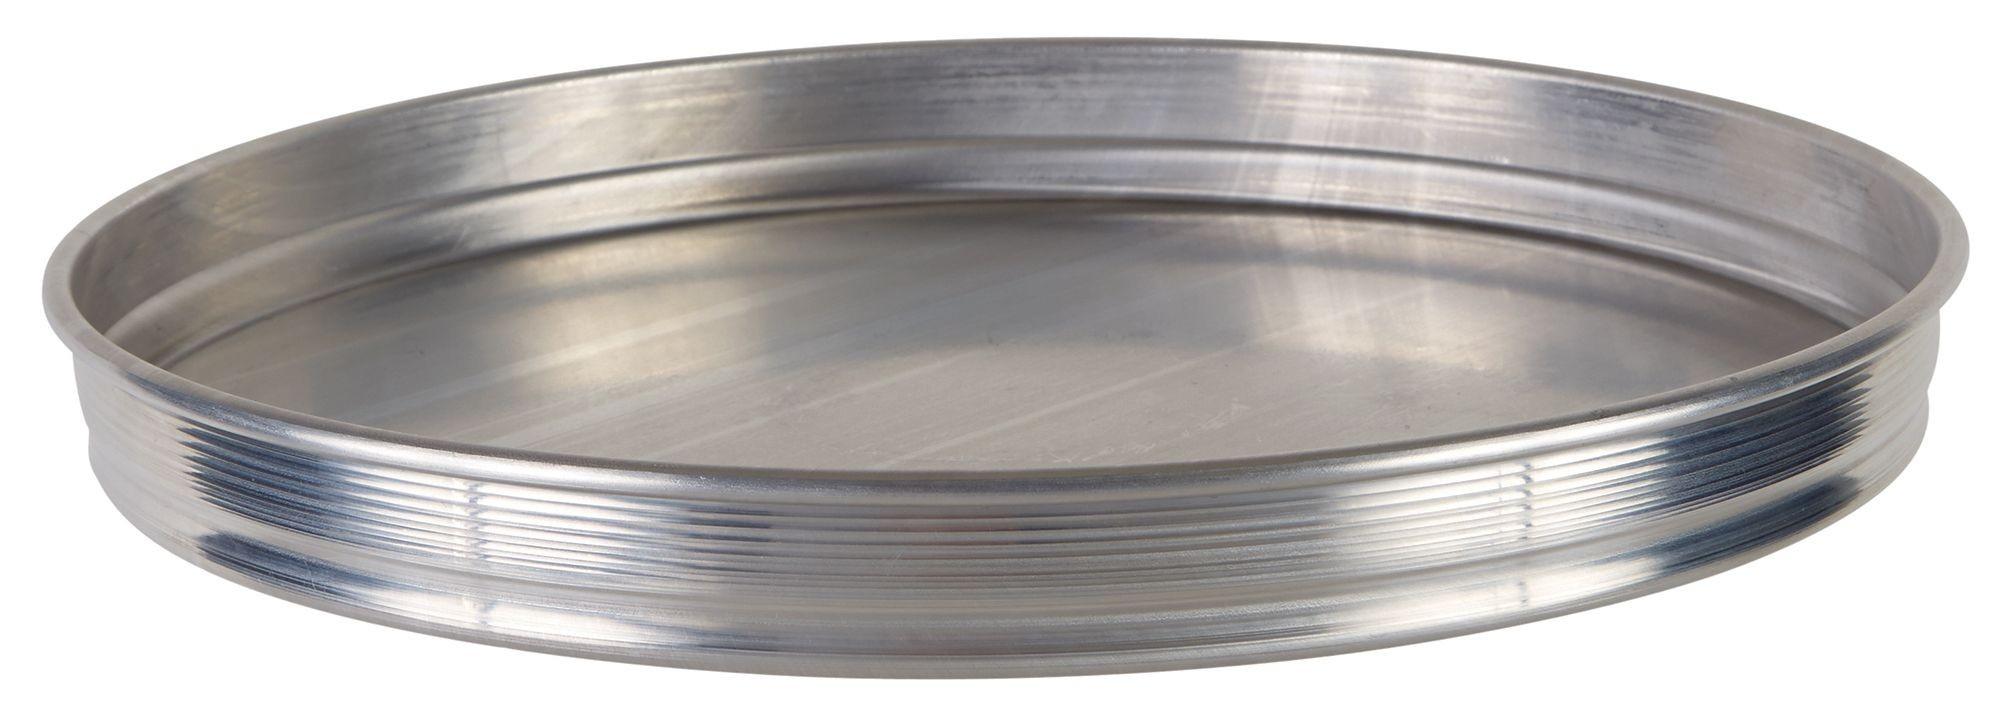 "Winco APZK-1215 12"" x 1-1/2"" Stackable Aluminum Pizza Pan"